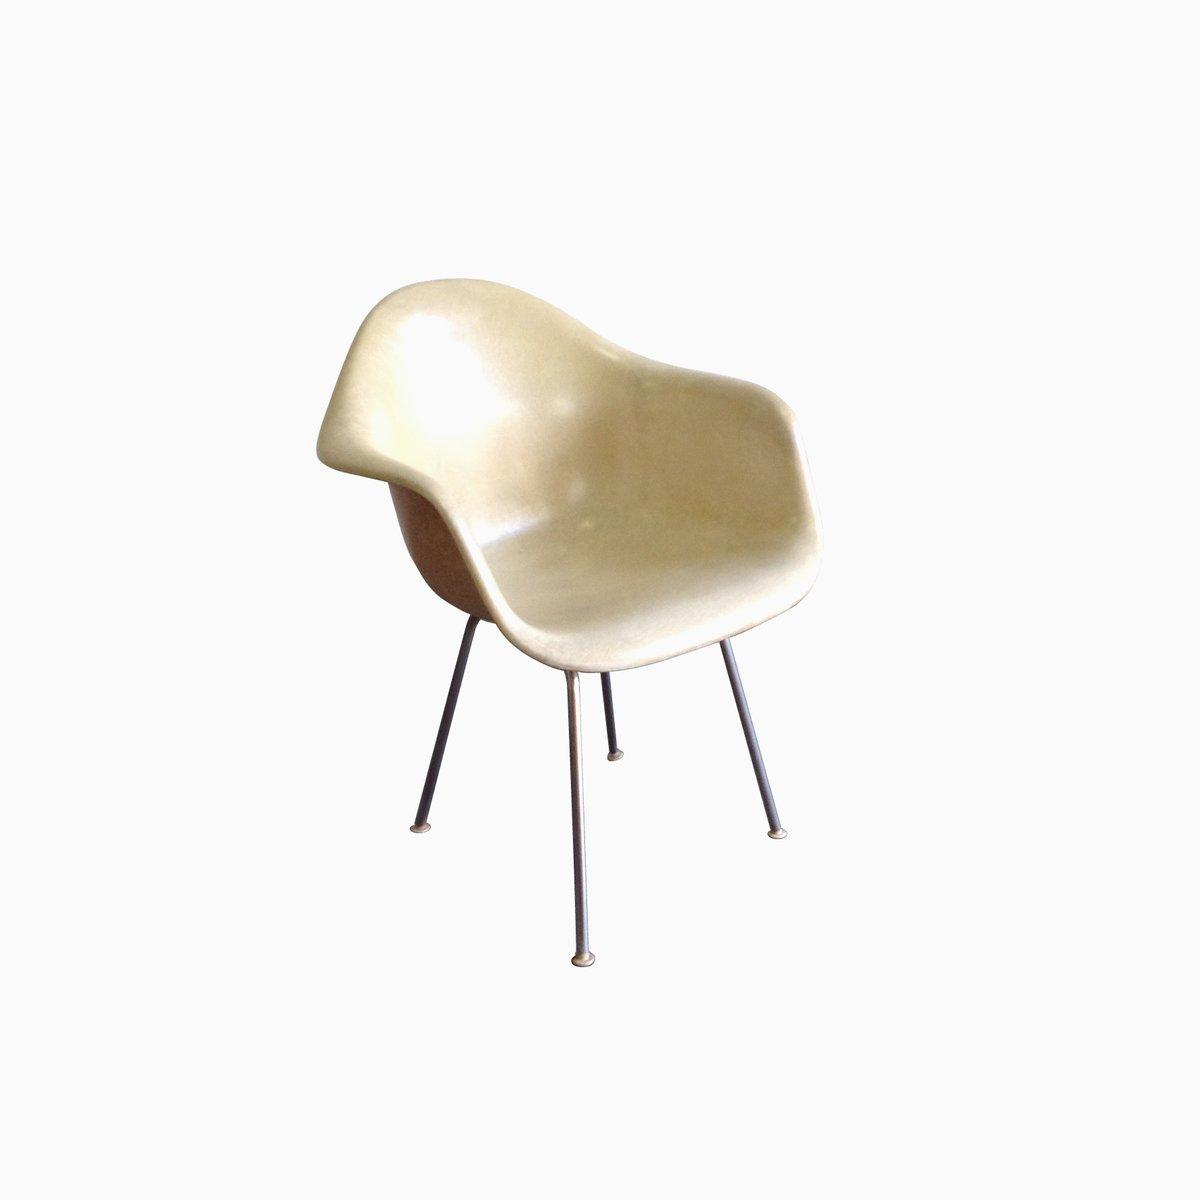 vintage stuhl von charles eames bei pamono kaufen. Black Bedroom Furniture Sets. Home Design Ideas